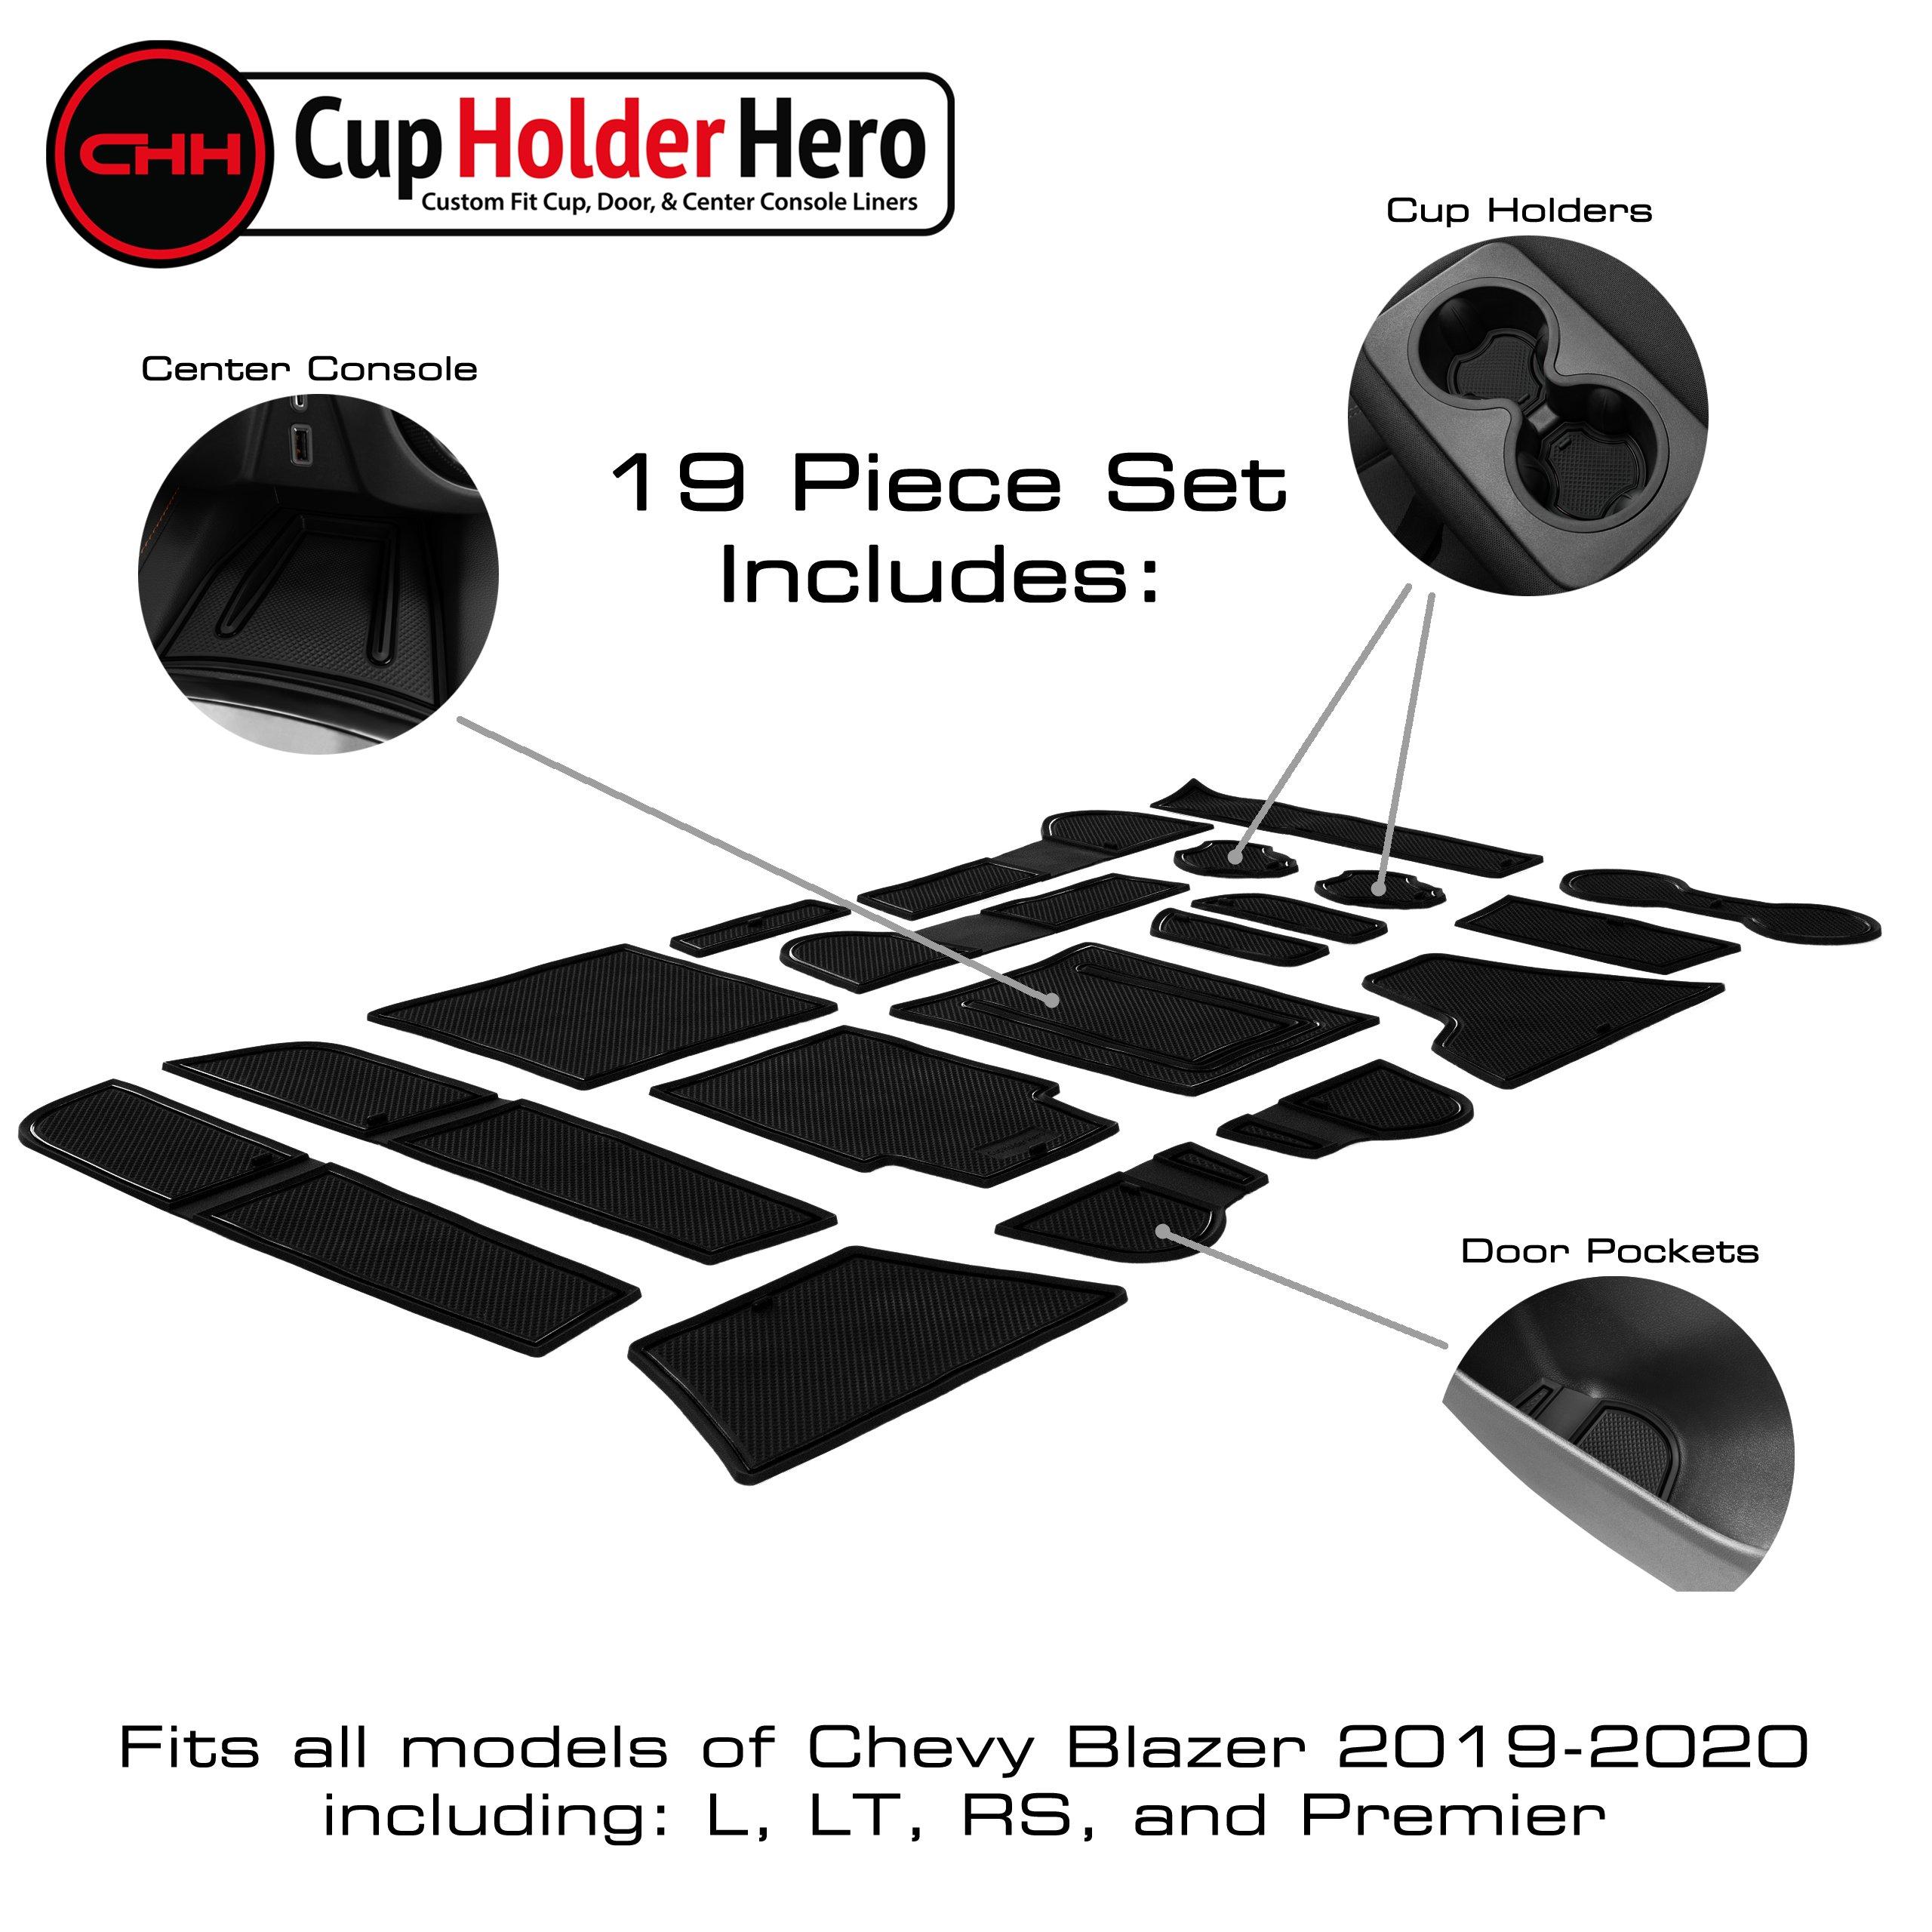 CupHolderHero-Chevy-Blazer-2019-2021-Liner-Accessories thumbnail 23